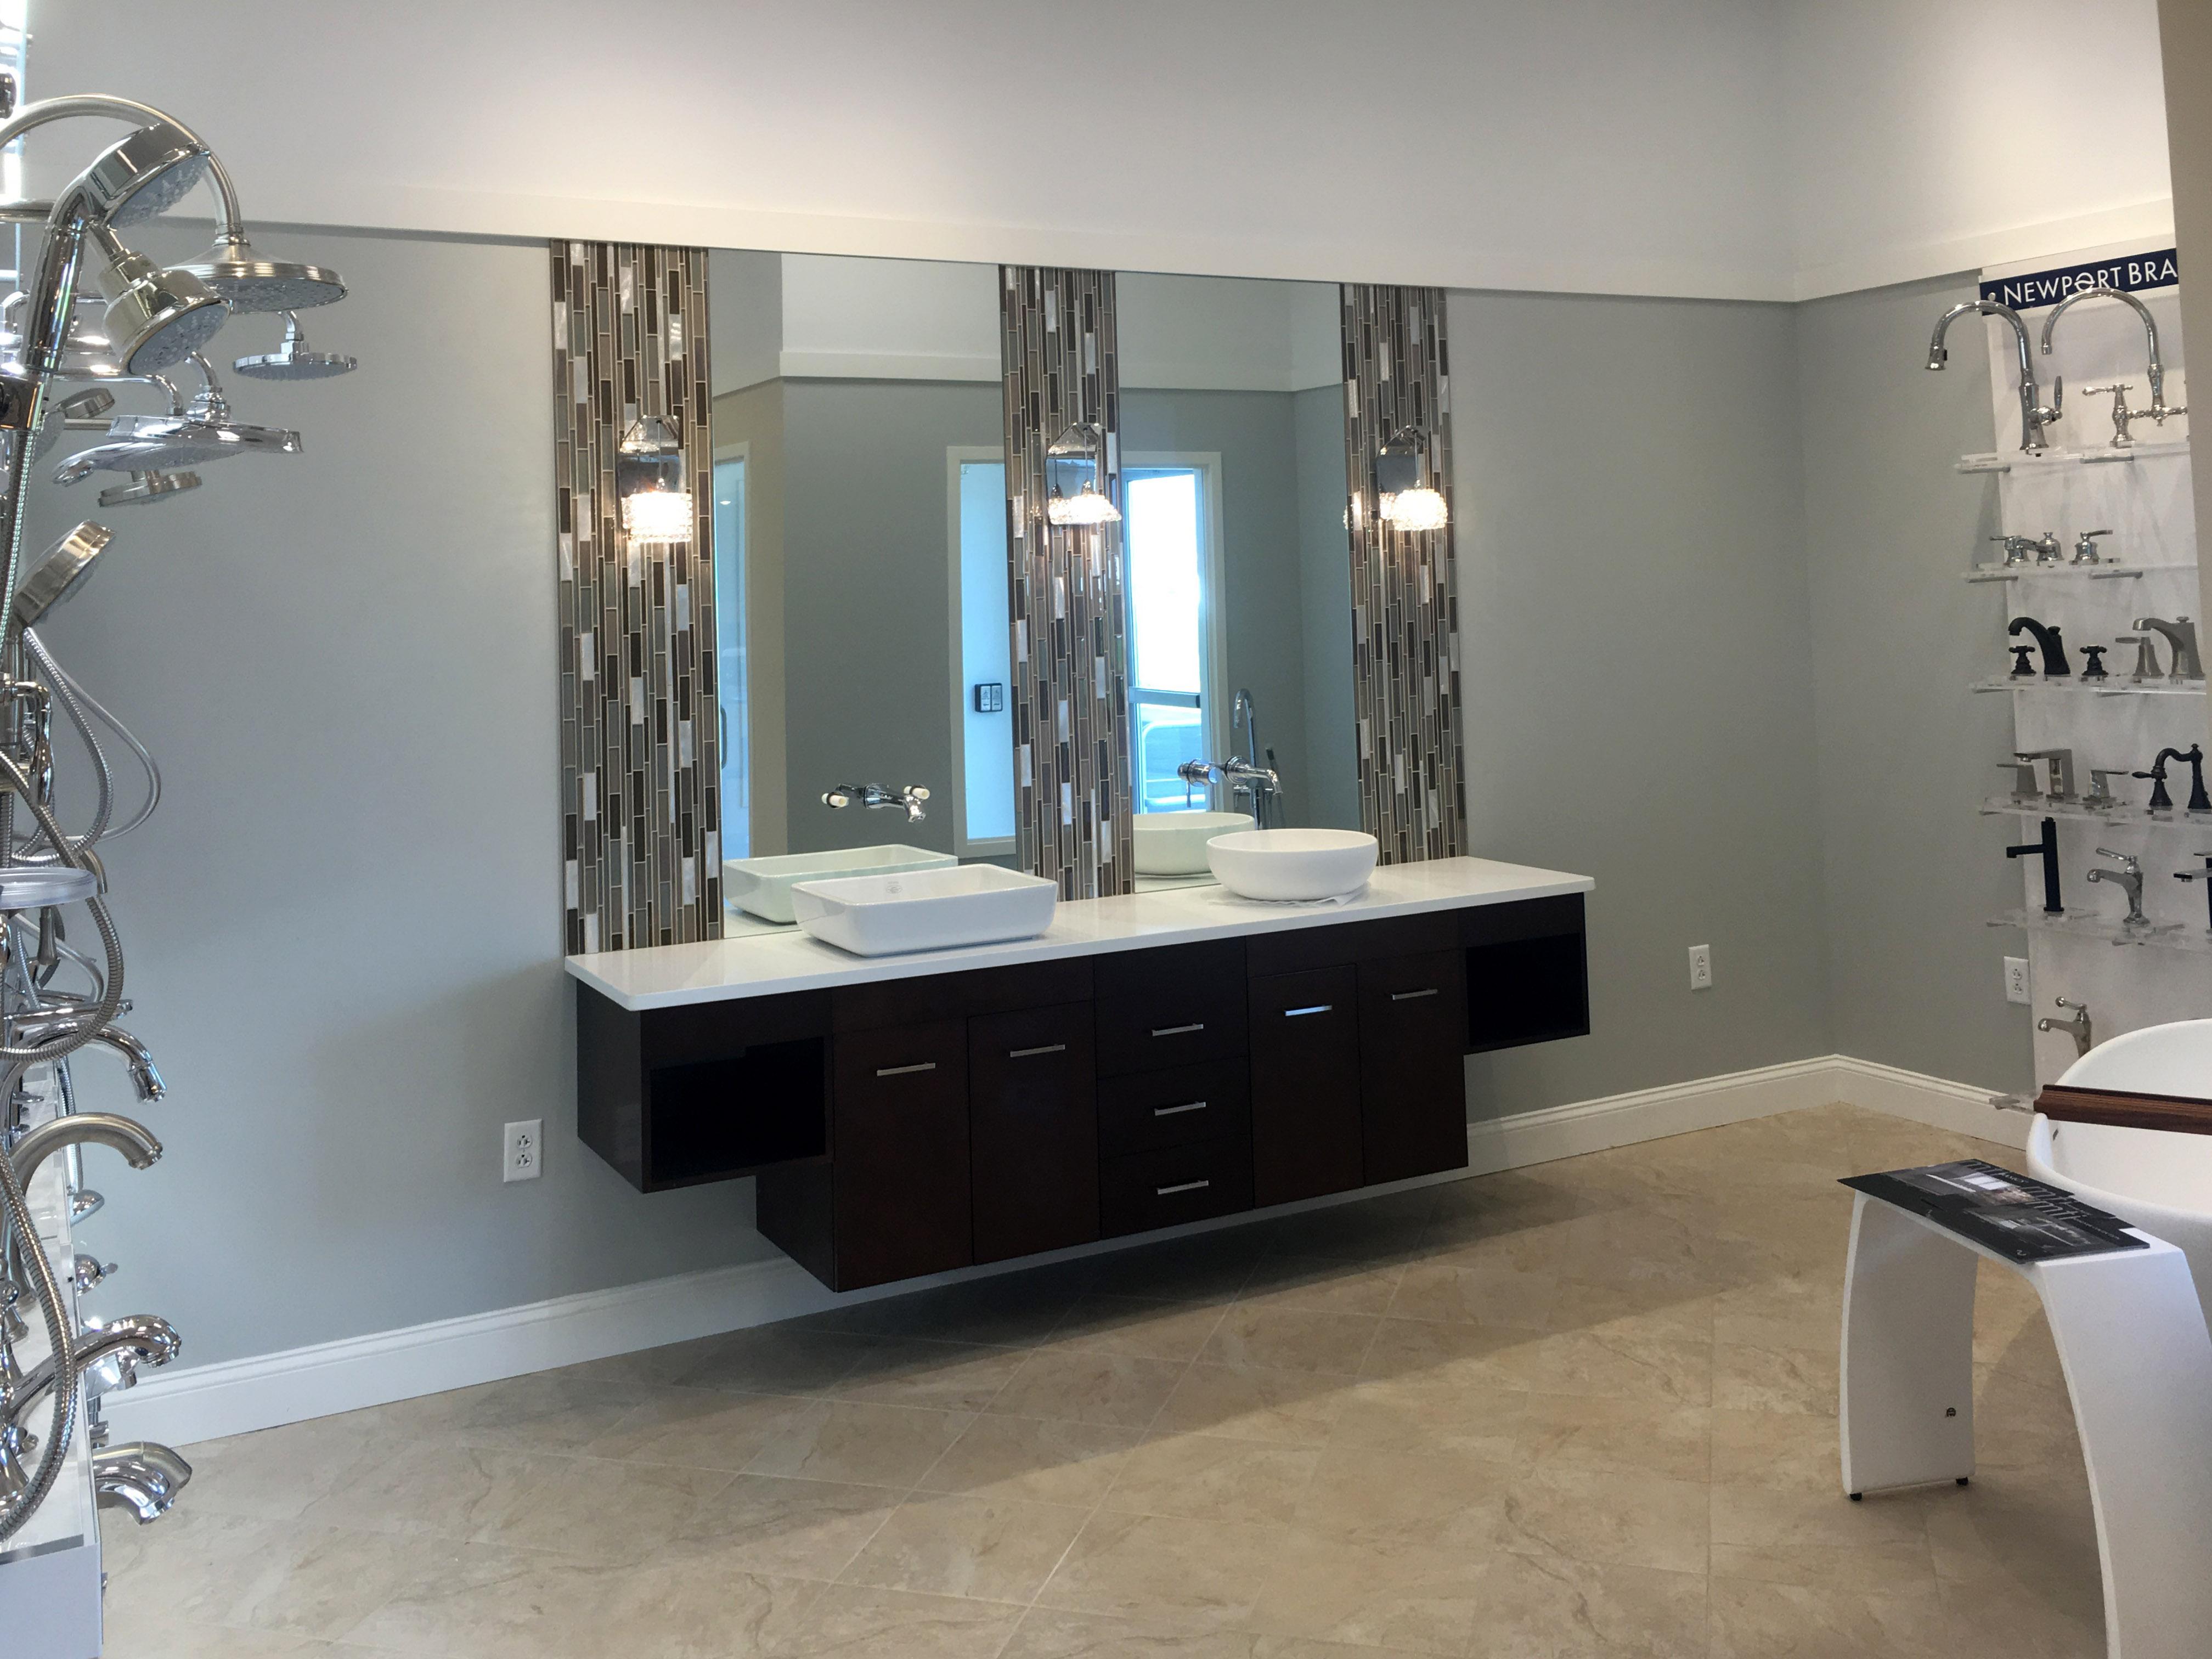 Frank Webb Bathroom Showroom RevolutionHR - Webb bathroom design